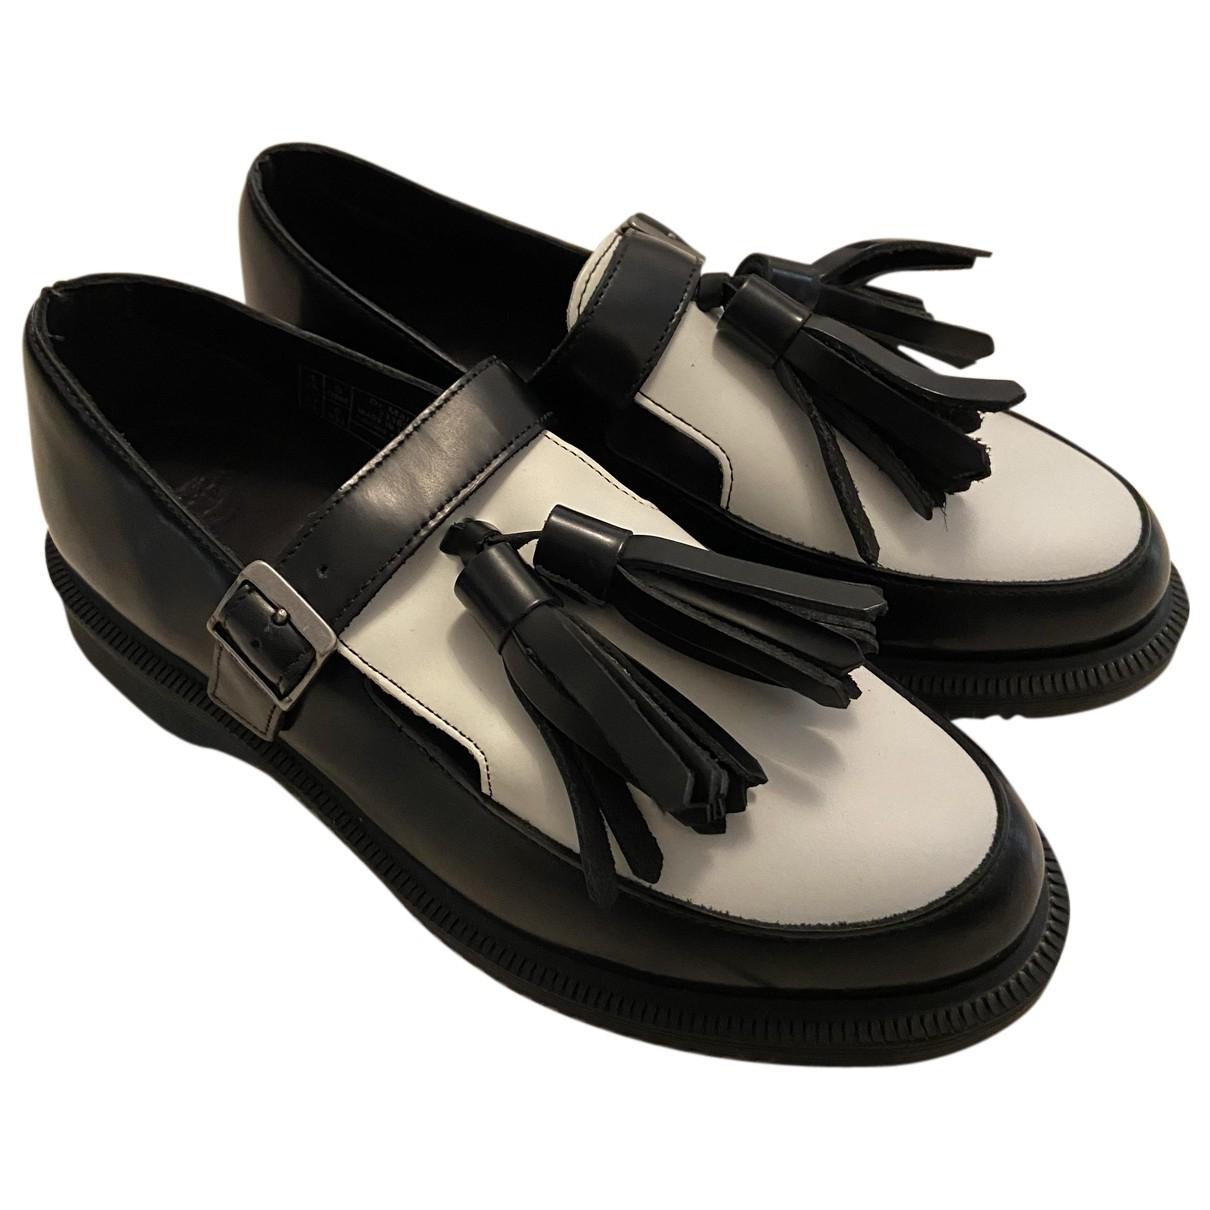 Dr. Martens N Black Leather Flats for Women 37 EU